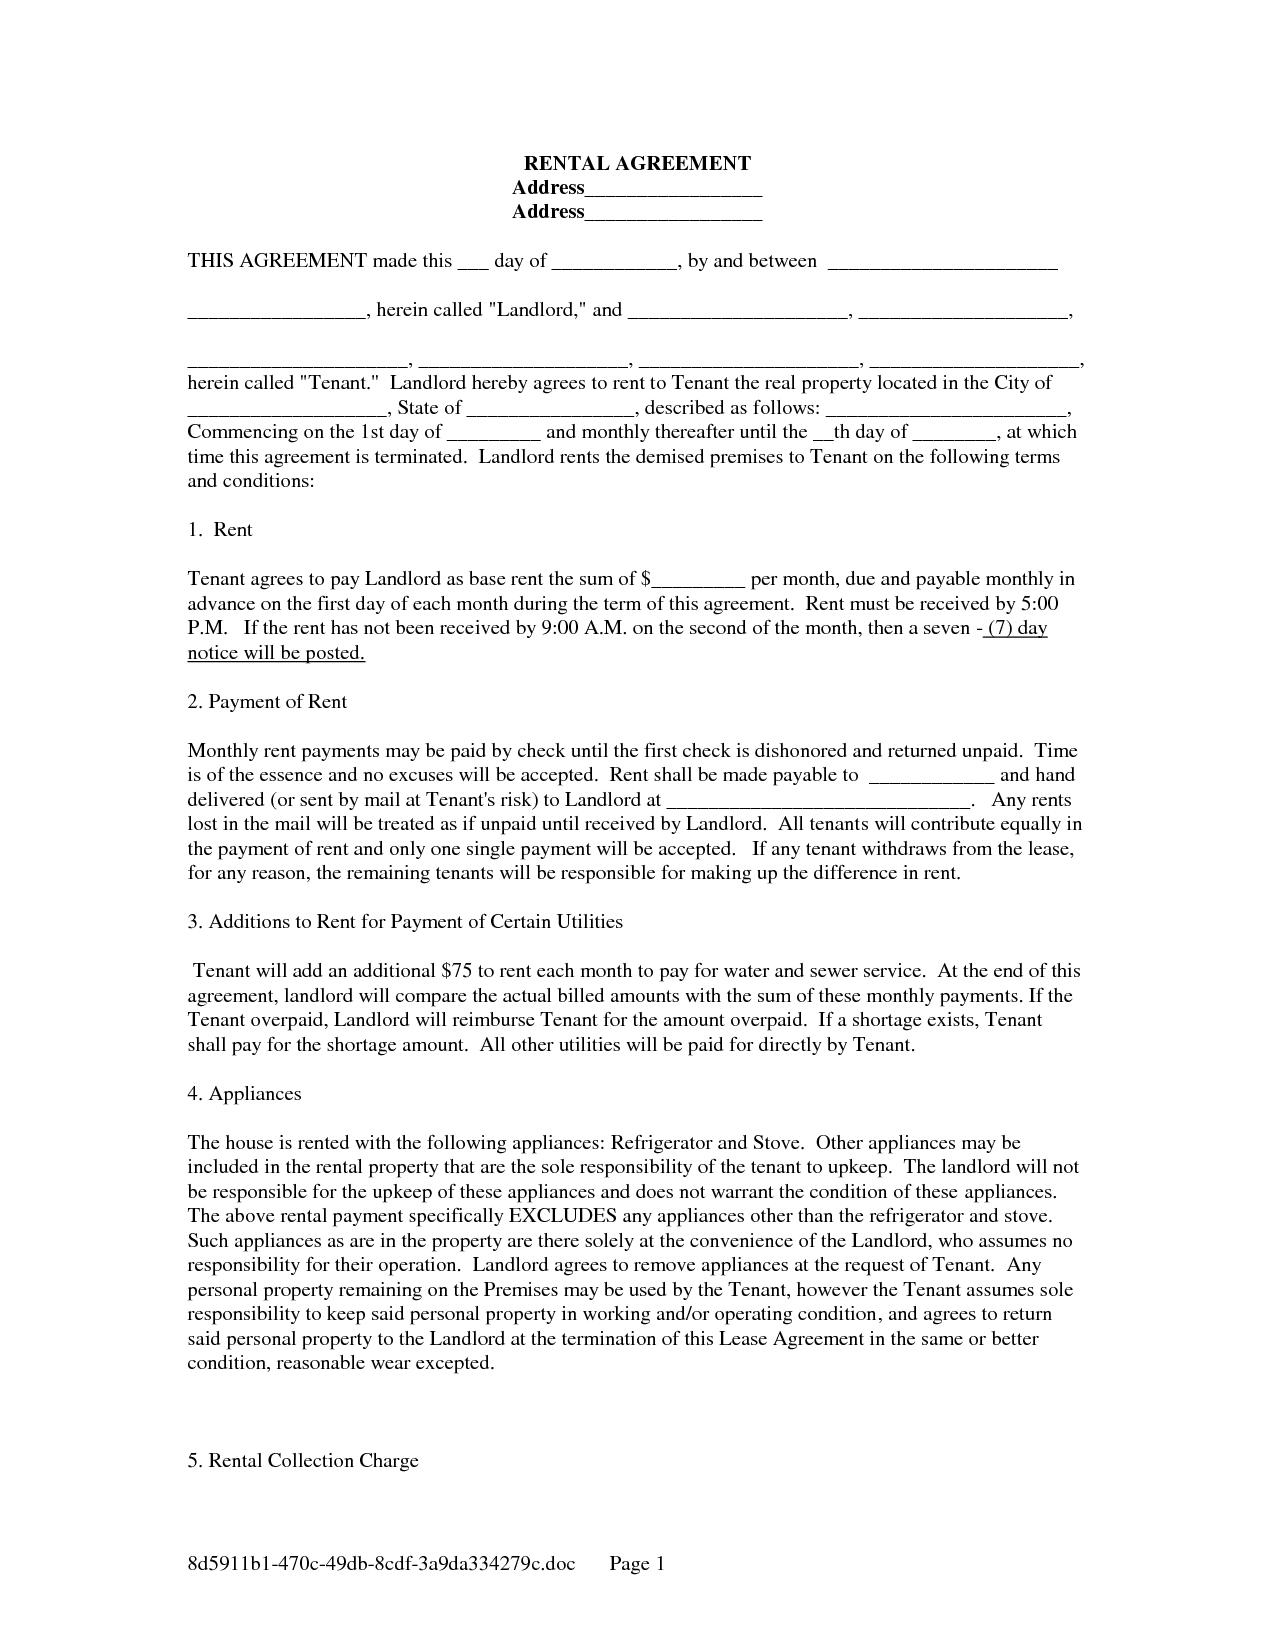 Free Copy Rental Lease Agreement | Free Rental Lease Agreement Forms - Free Printable Rental Lease Agreement